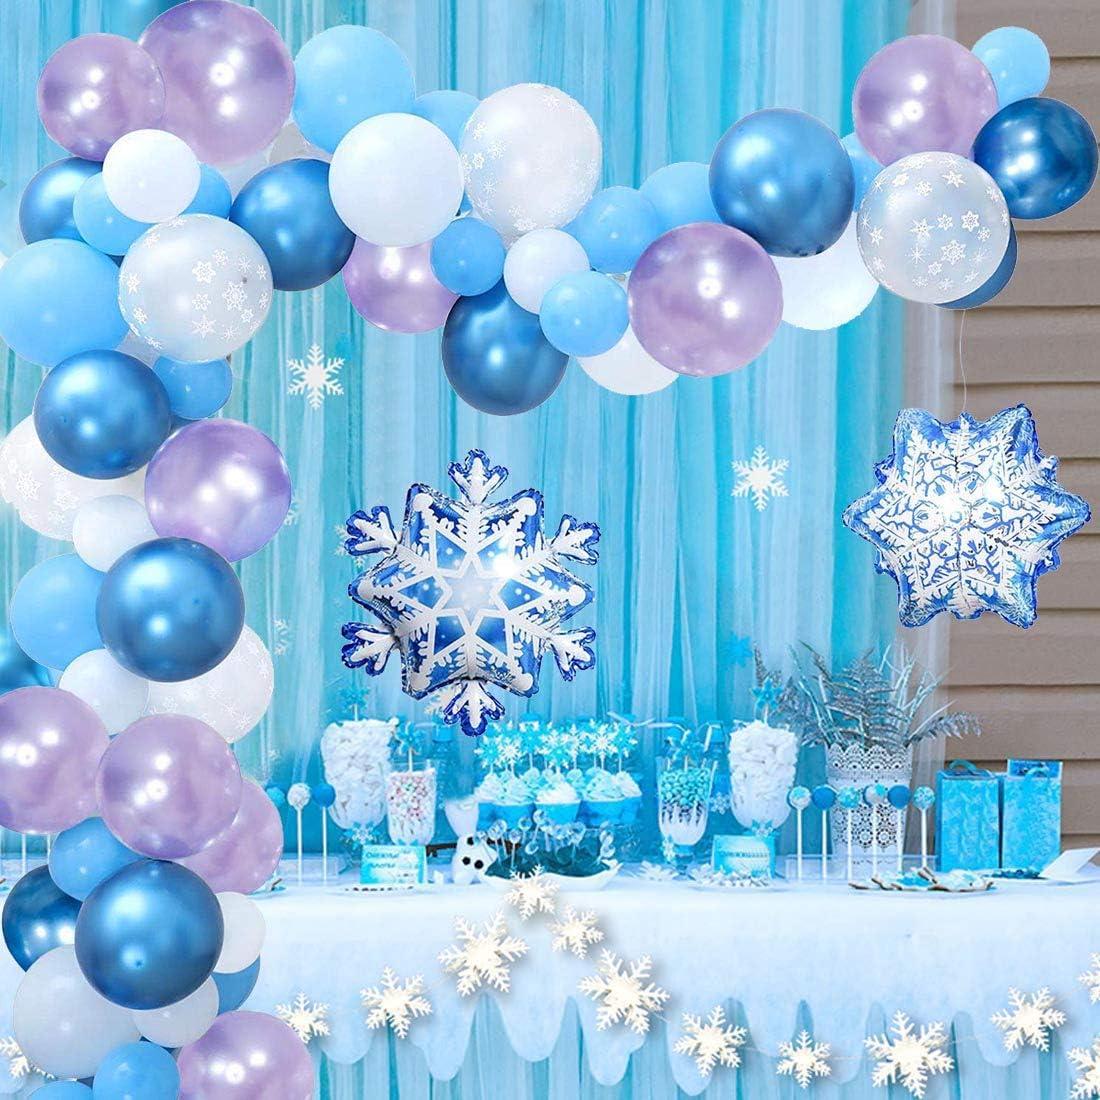 YiRAN Frozen Balloon Garland Arch Kit 7Ft Long Frozen Birthday Party  Supplies, Snowflake Decorations, Frozen Party Decorations, Frozen Balloons,